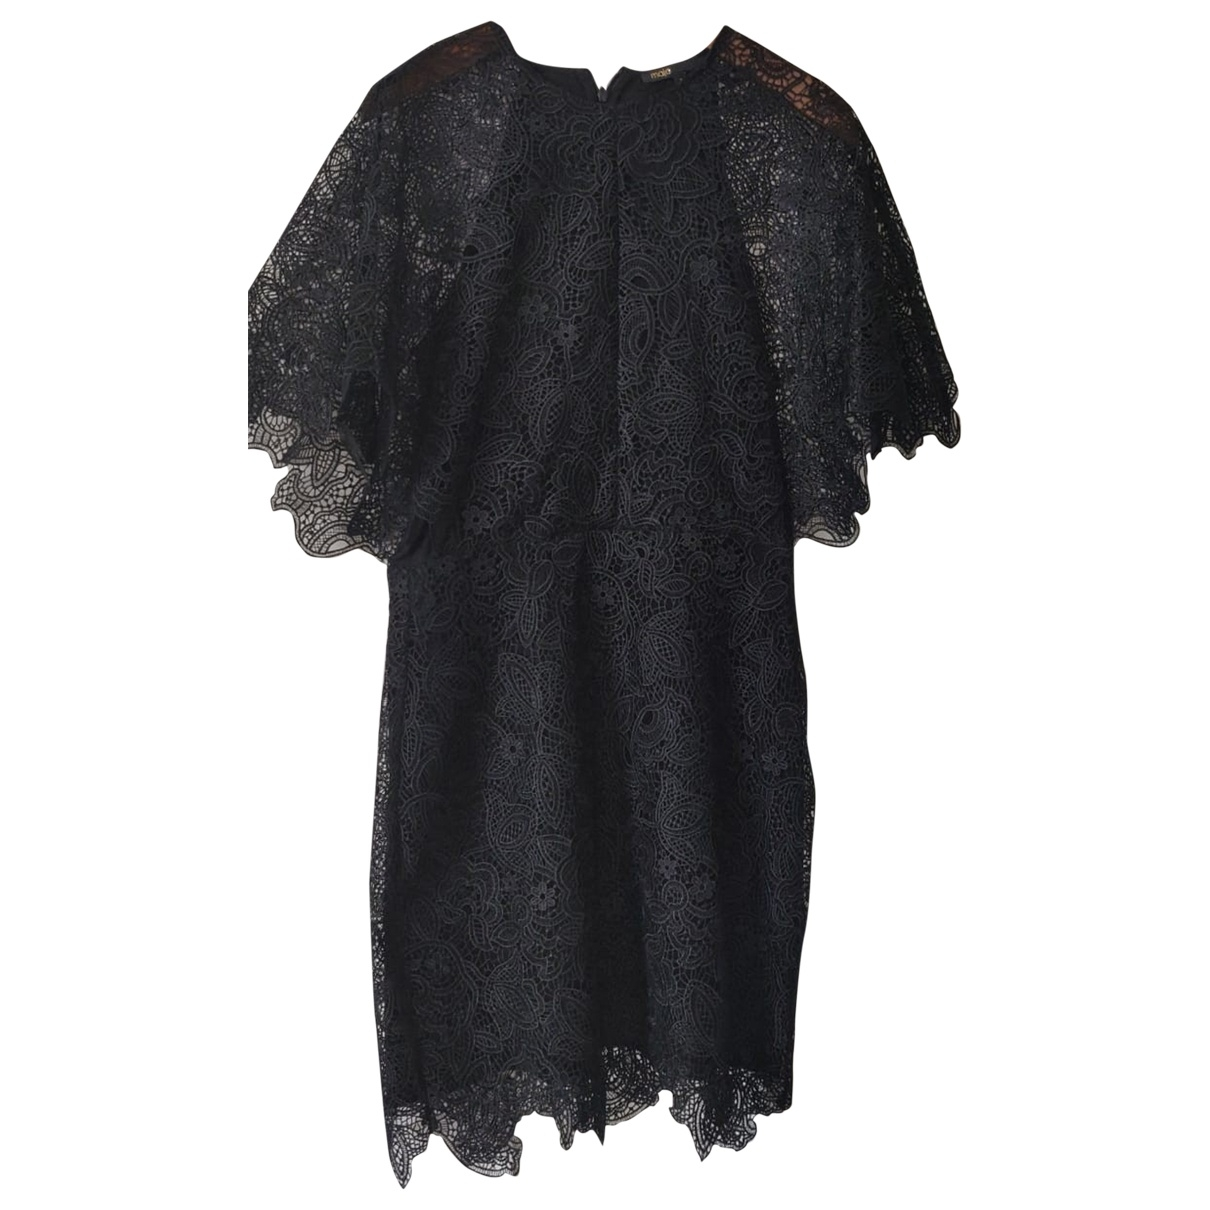 Maje \N Black Lace dress for Women 36 FR